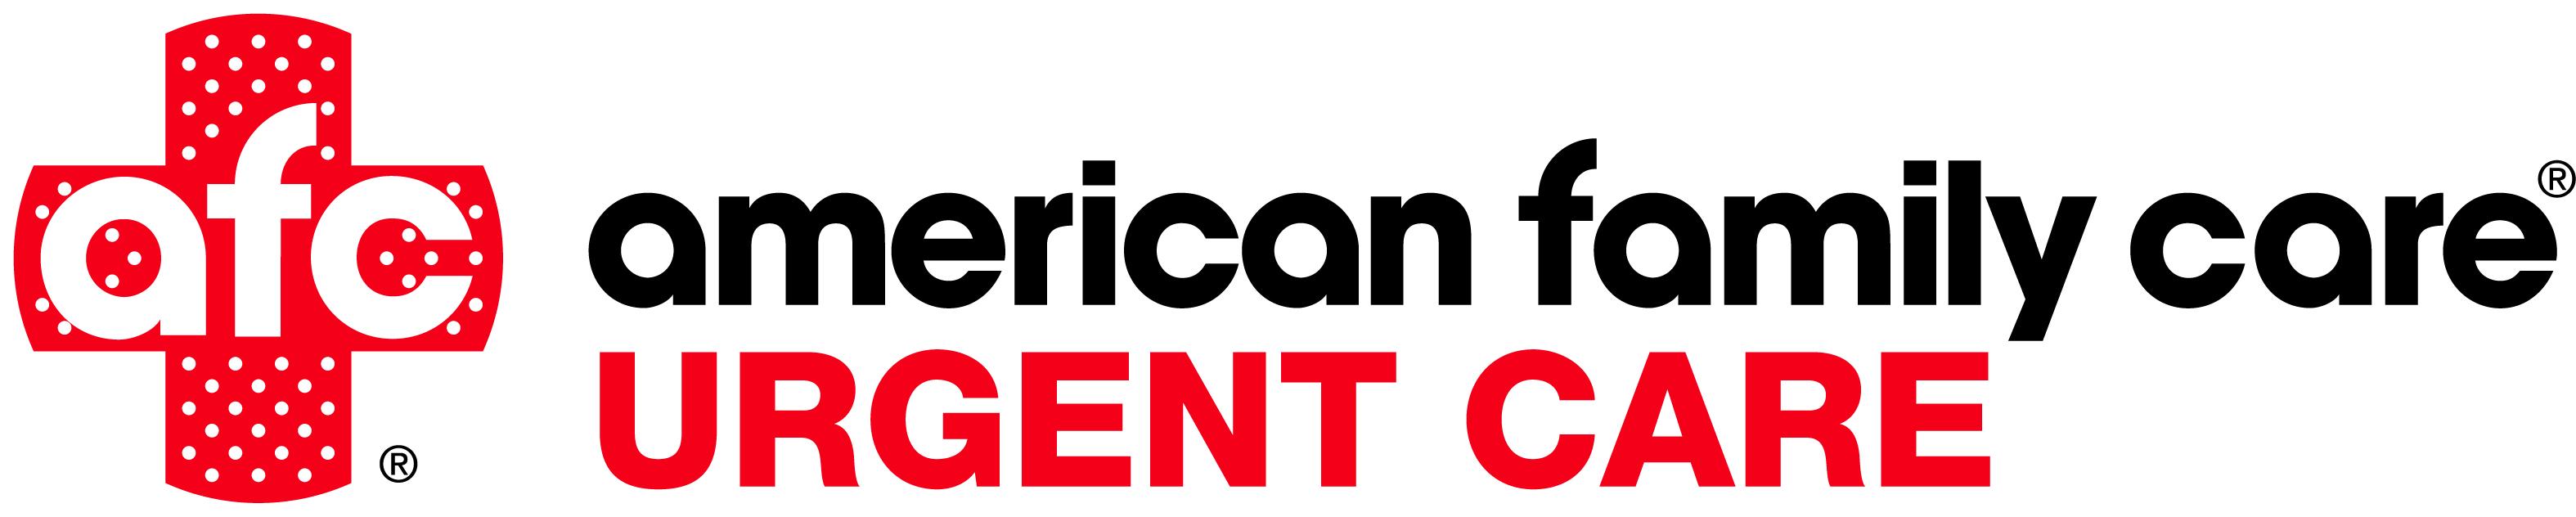 Afc urgent care logo horizontal